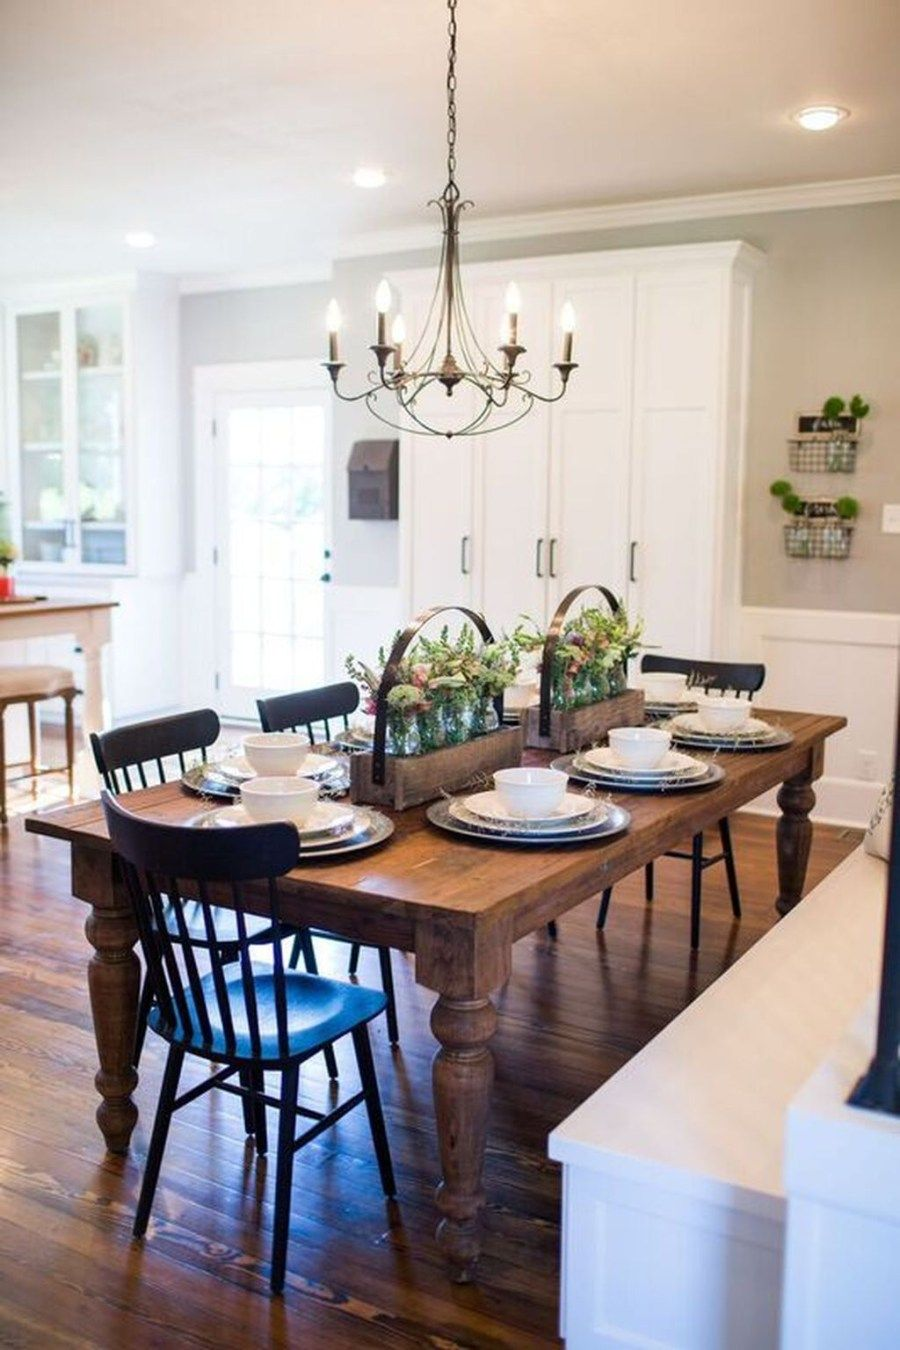 Farmhouse Dining Table, Joanna Gaines Dining Room